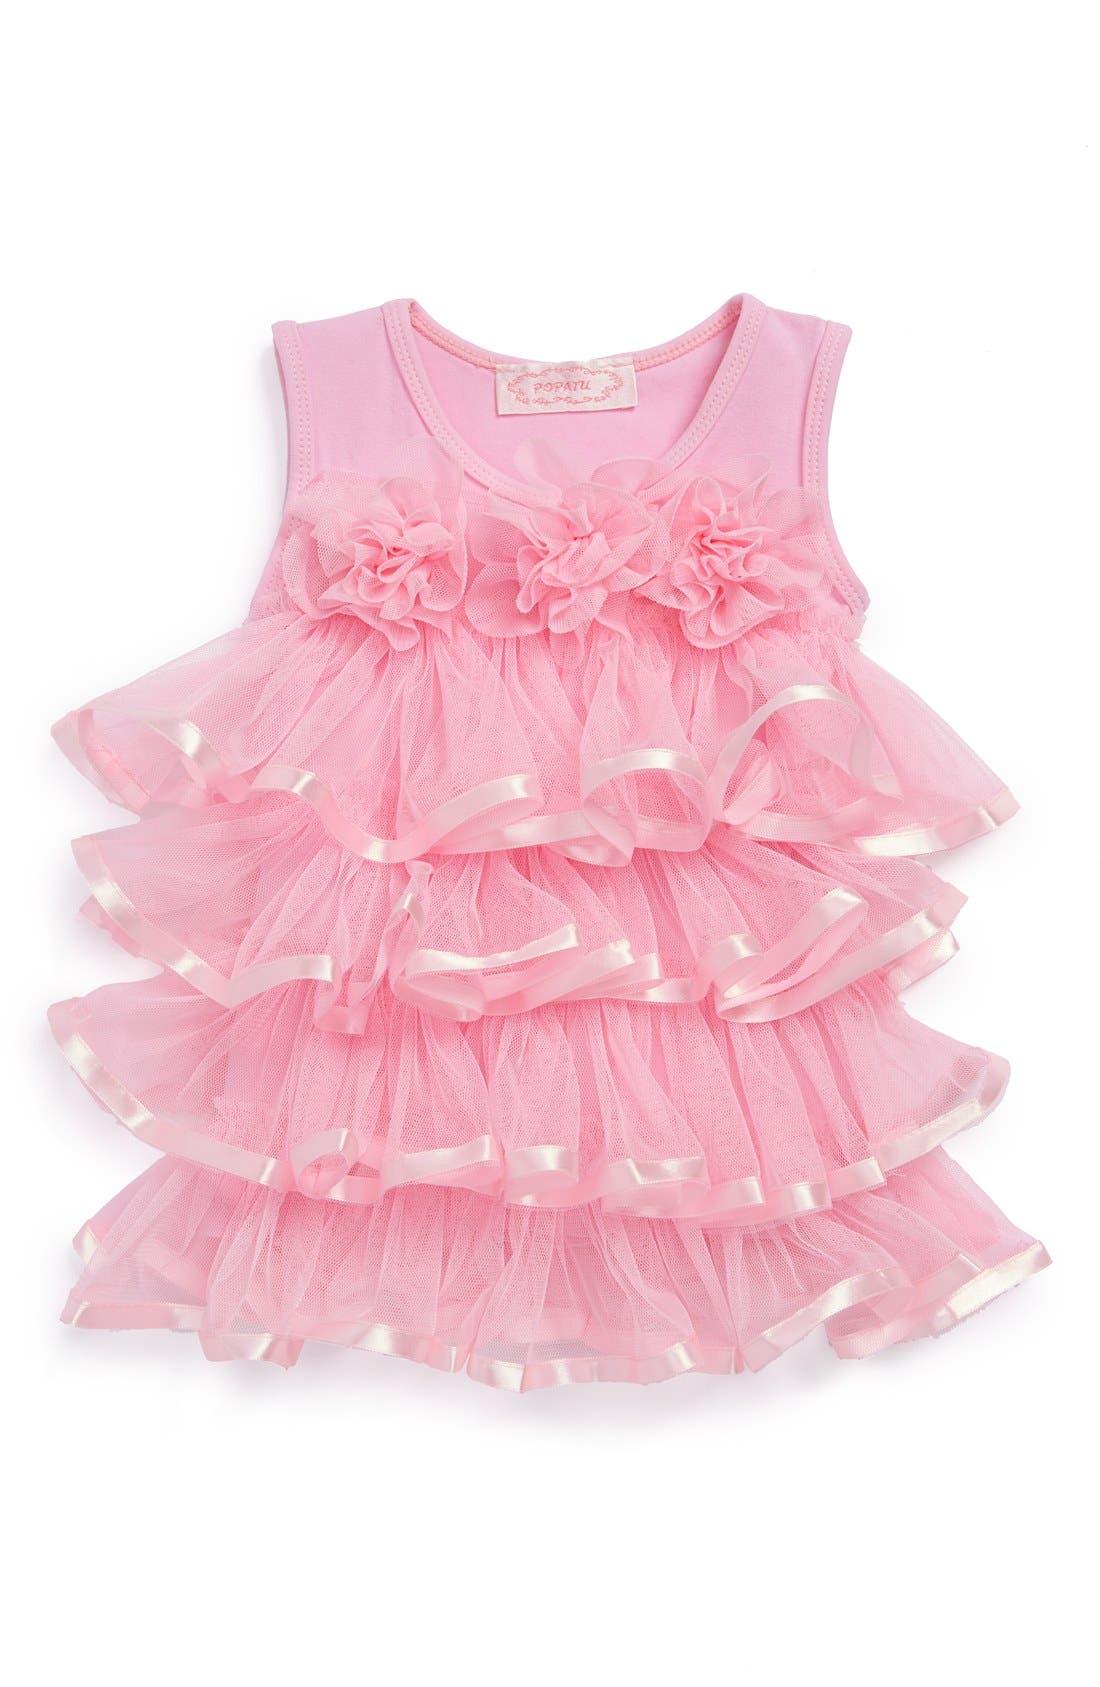 Alternate Image 1 Selected - Popatu Ruffle Tiered Dress (Baby Girls)